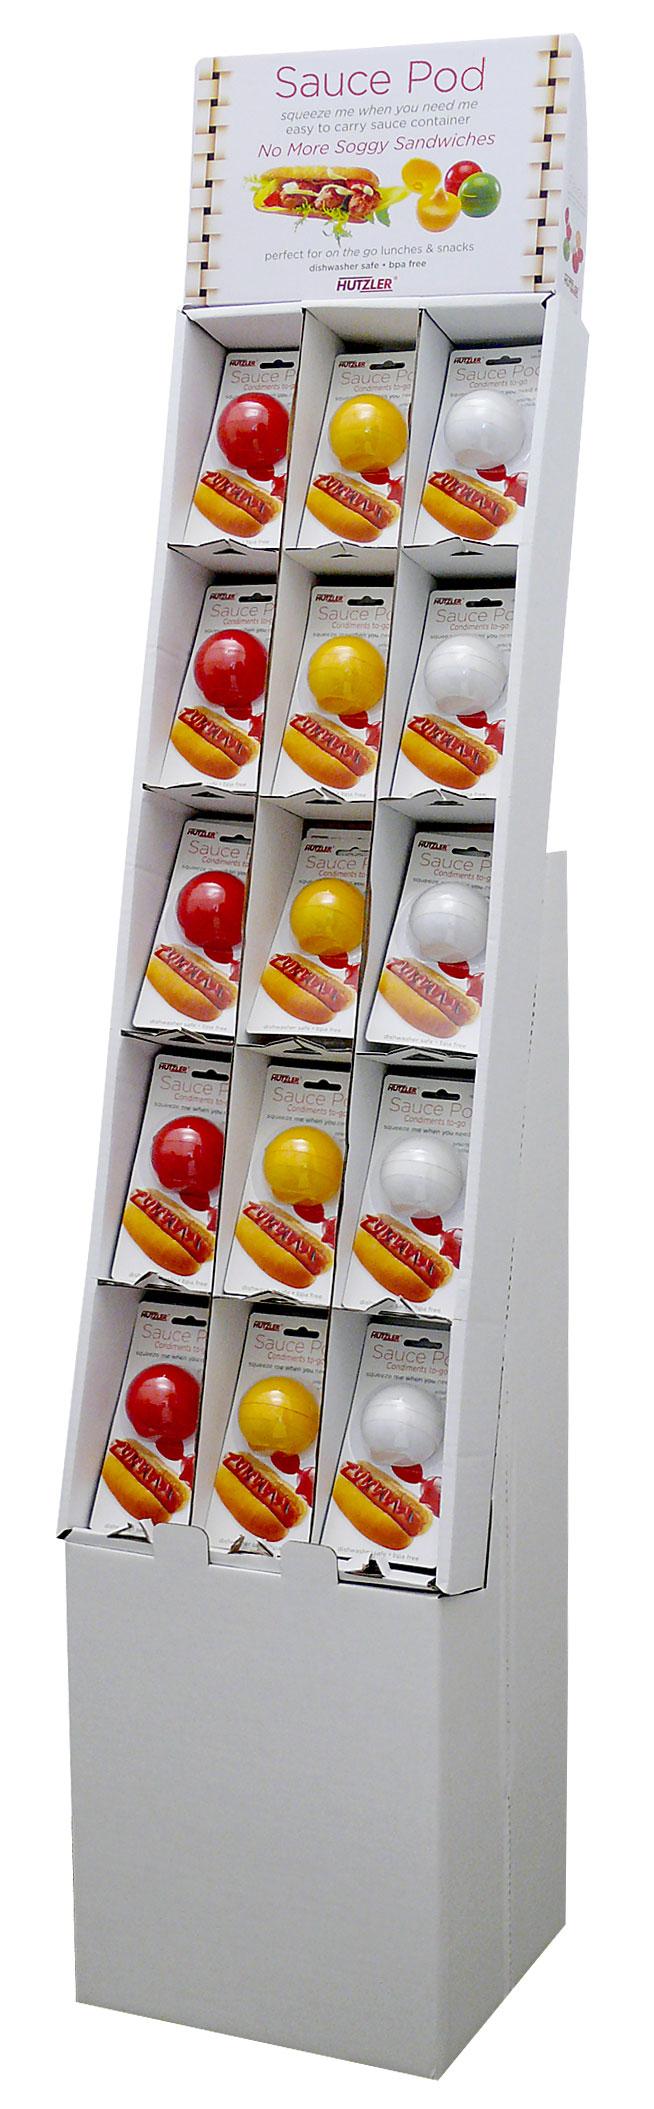 Sauce Pod Floor Display